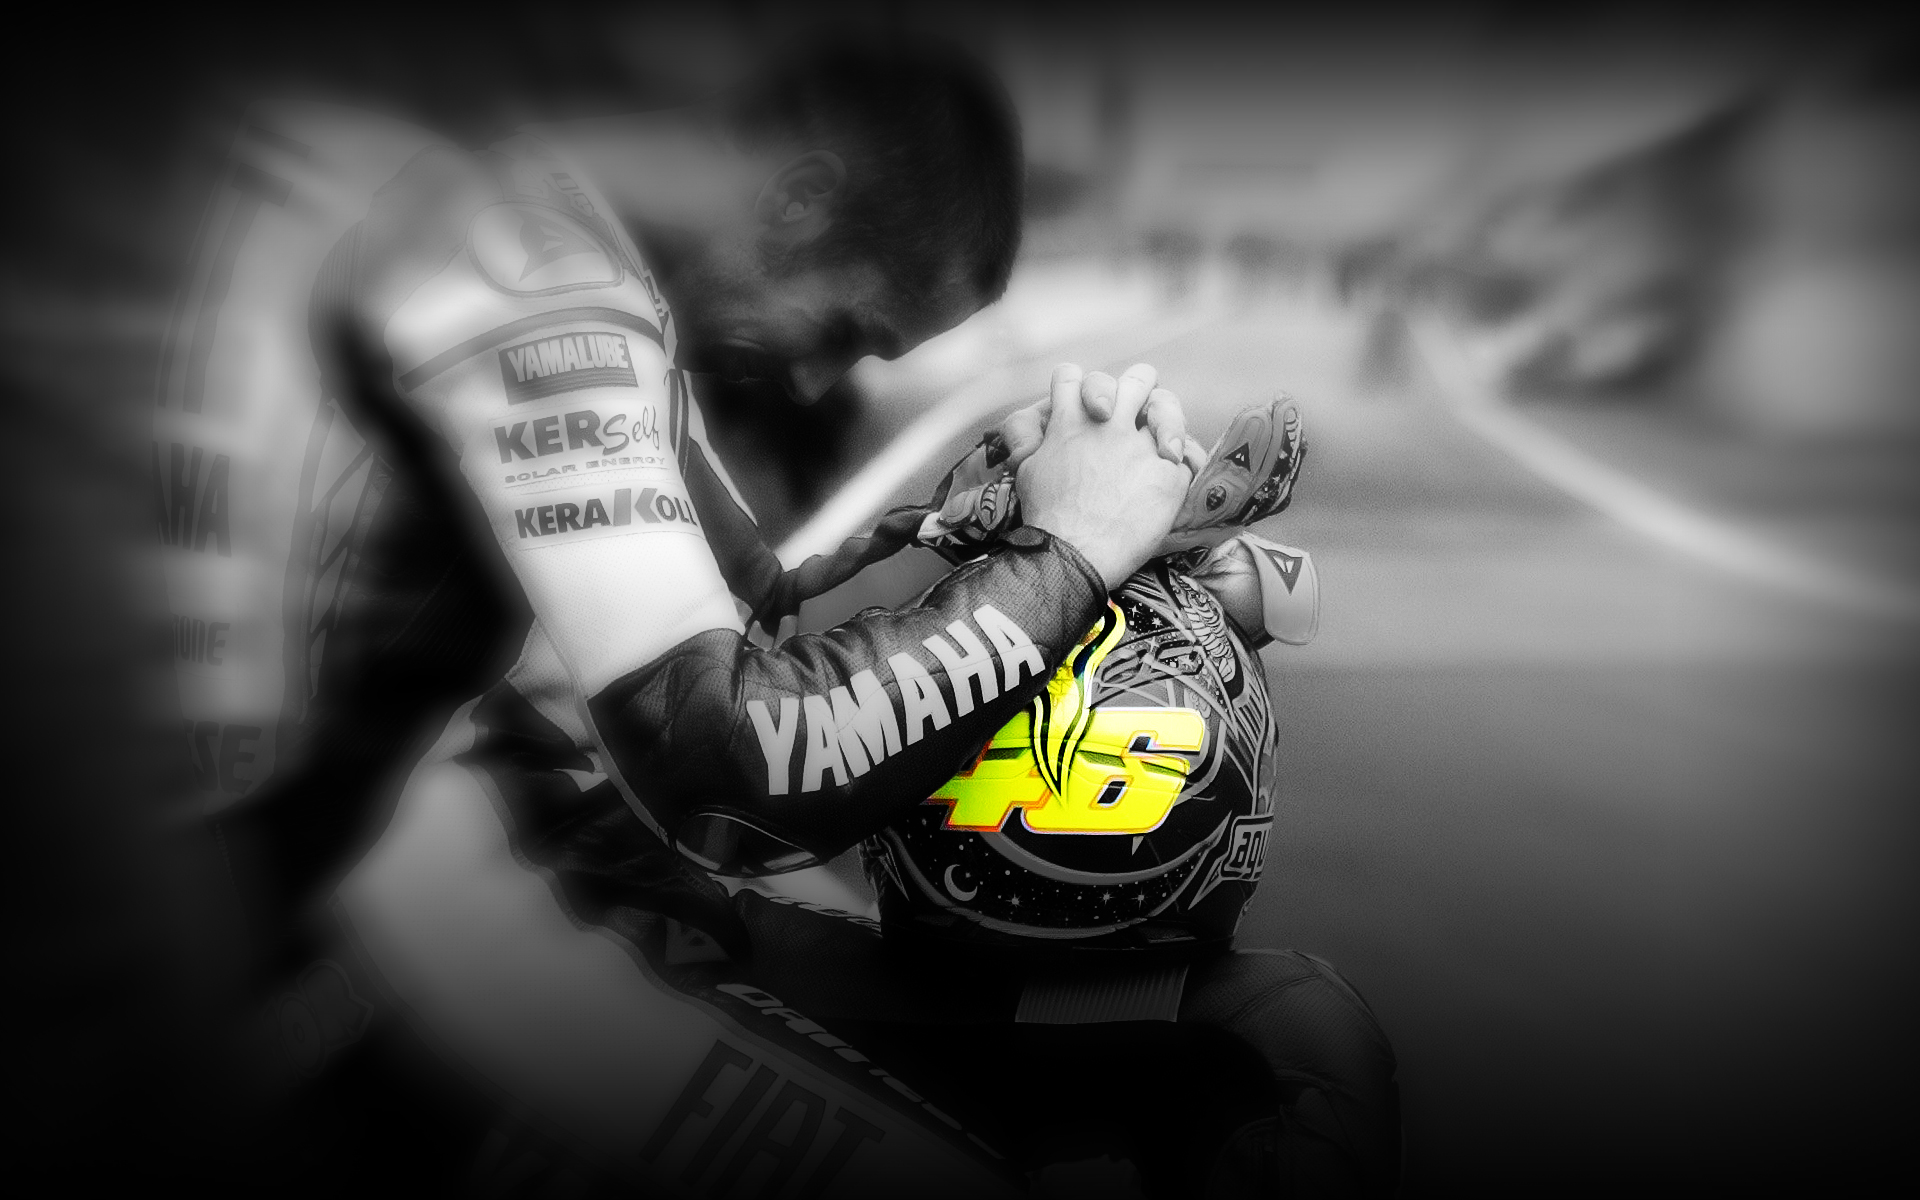 Valentino Rossi MotoGP Wallpapers HD Image 8441 Wallpaper 1920x1200